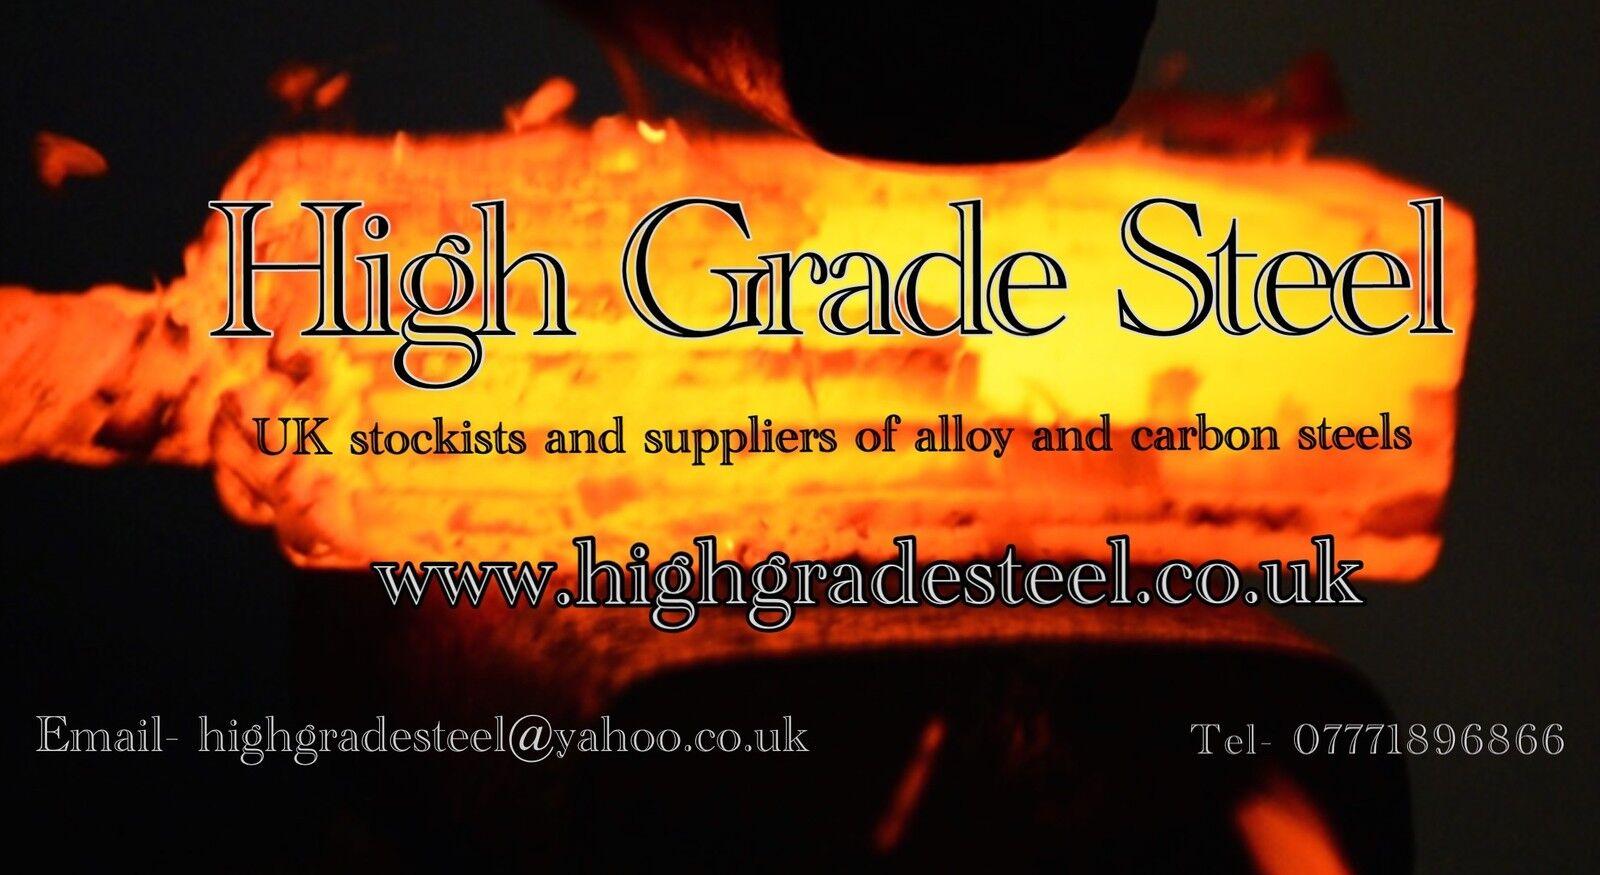 High Grade Steel